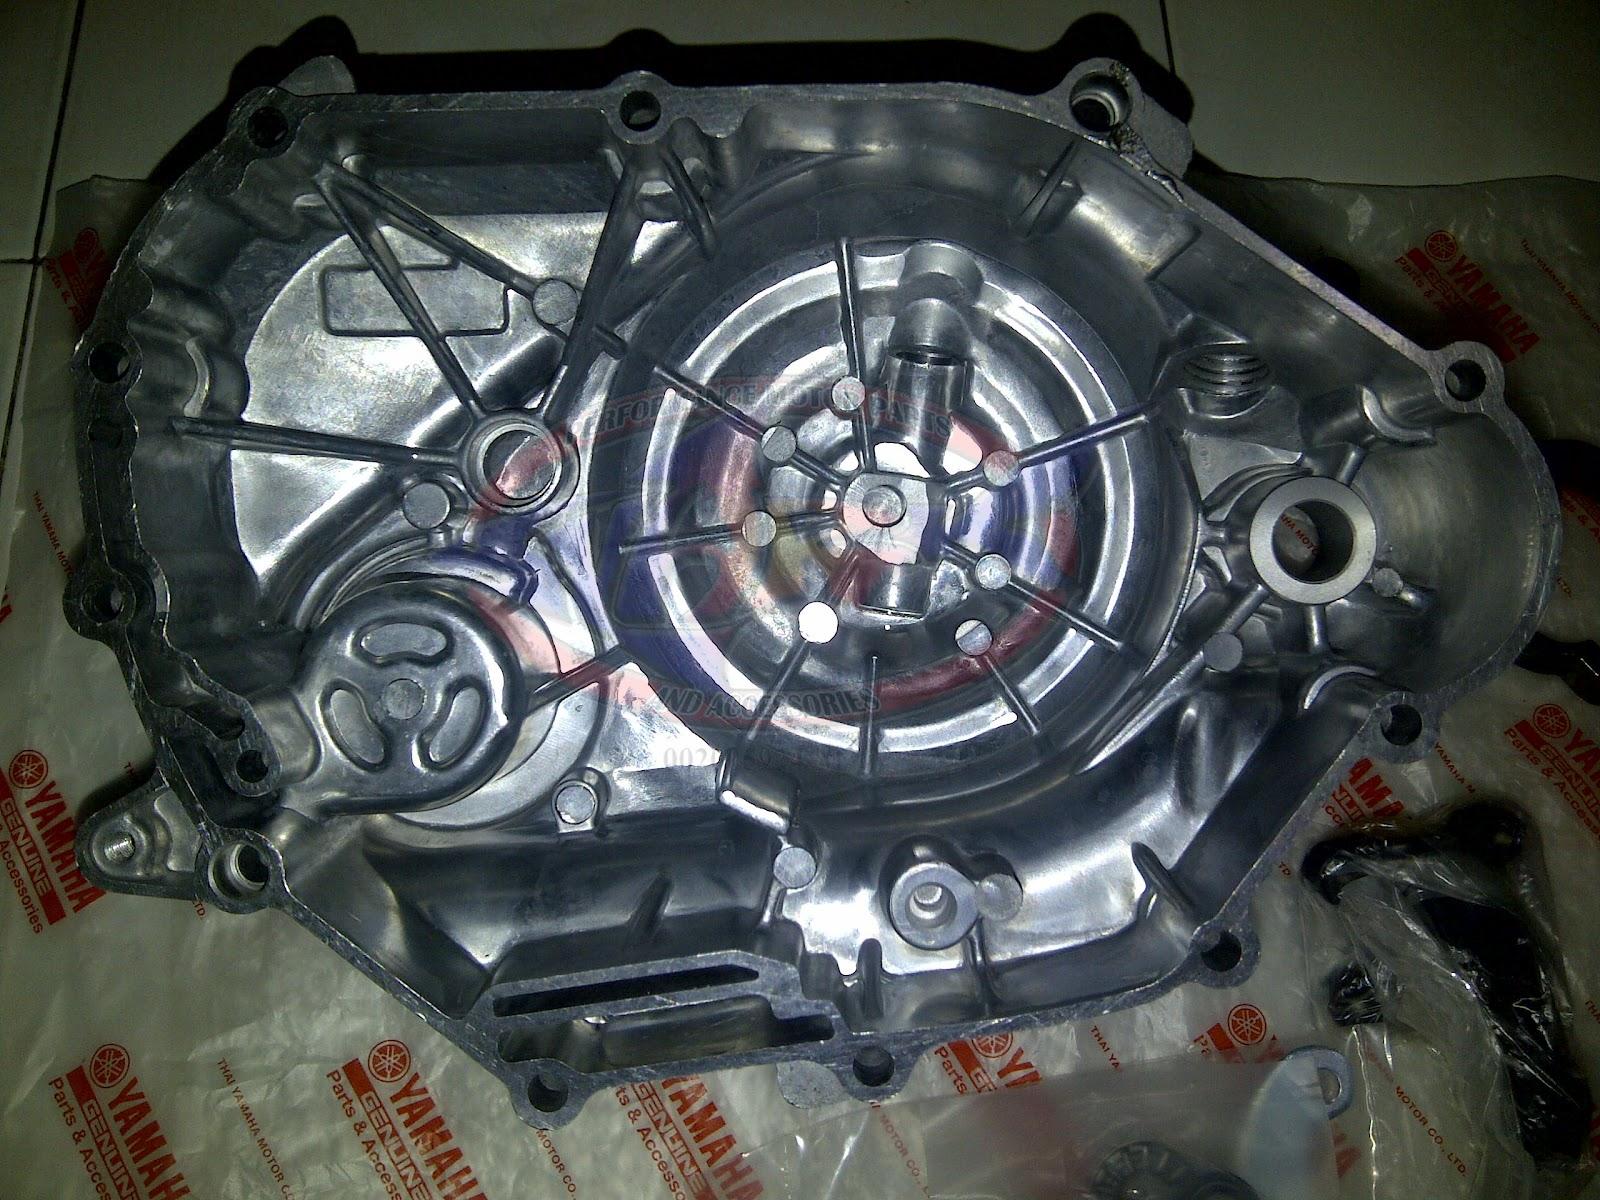 syark performance motor parts and accessories online shop yamaha vega manual yamaha vega manual